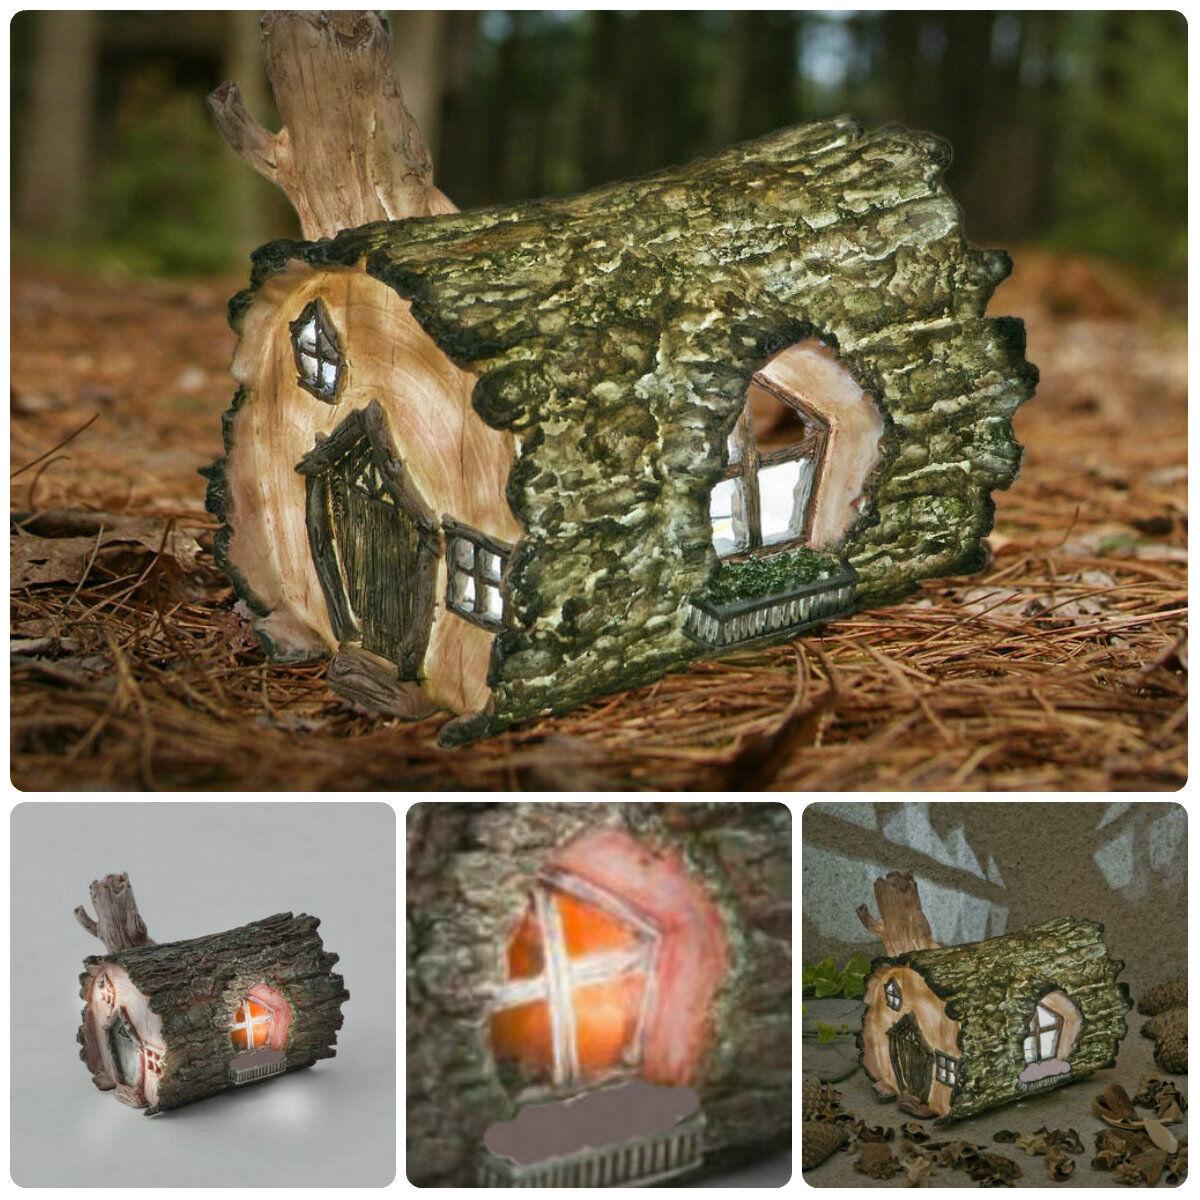 Fairy garden ornaments - New Fairy Garden Accessories Fairy Door Tree Face Fairy House Garden Ornaments